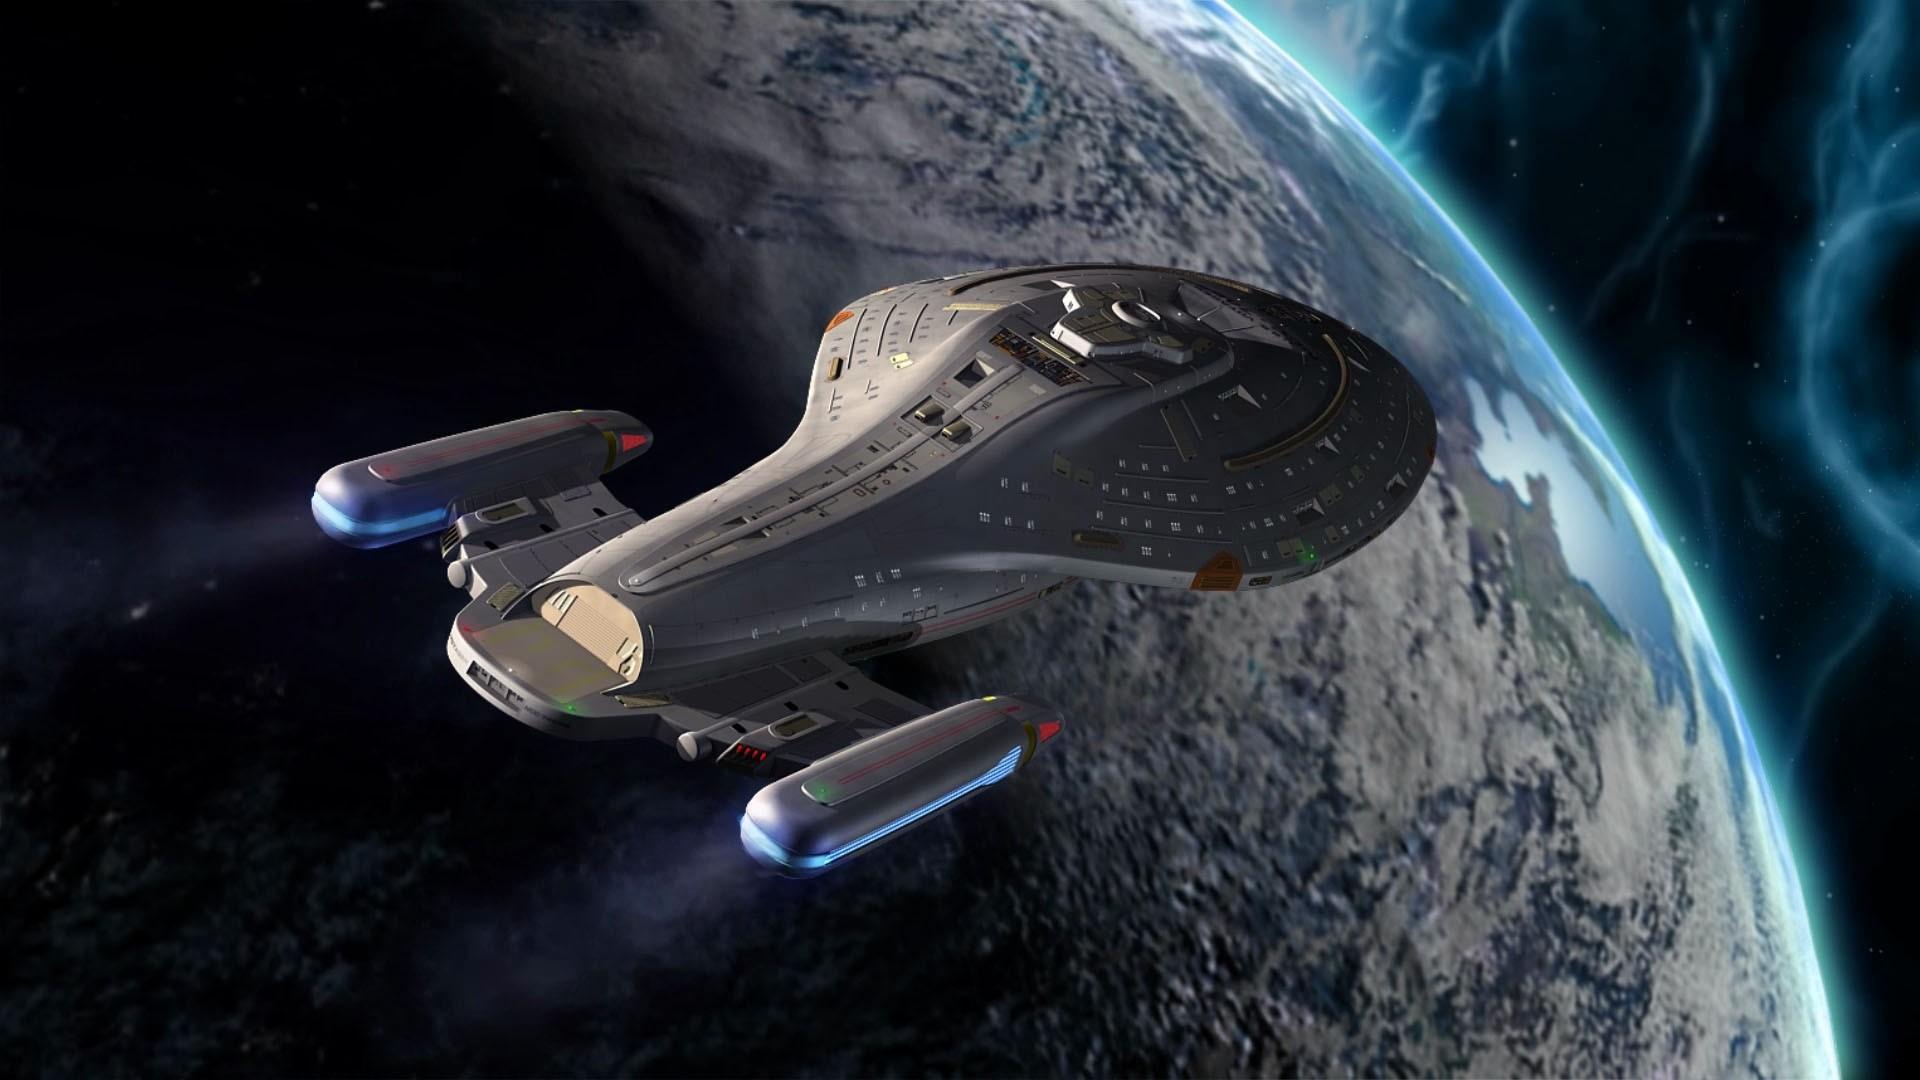 Moon Satelite Shinings Galaxy Backgrounds Uniques Shinings Elegance Star  Trek Wallpaper Beautifull Satelite Machines Cool